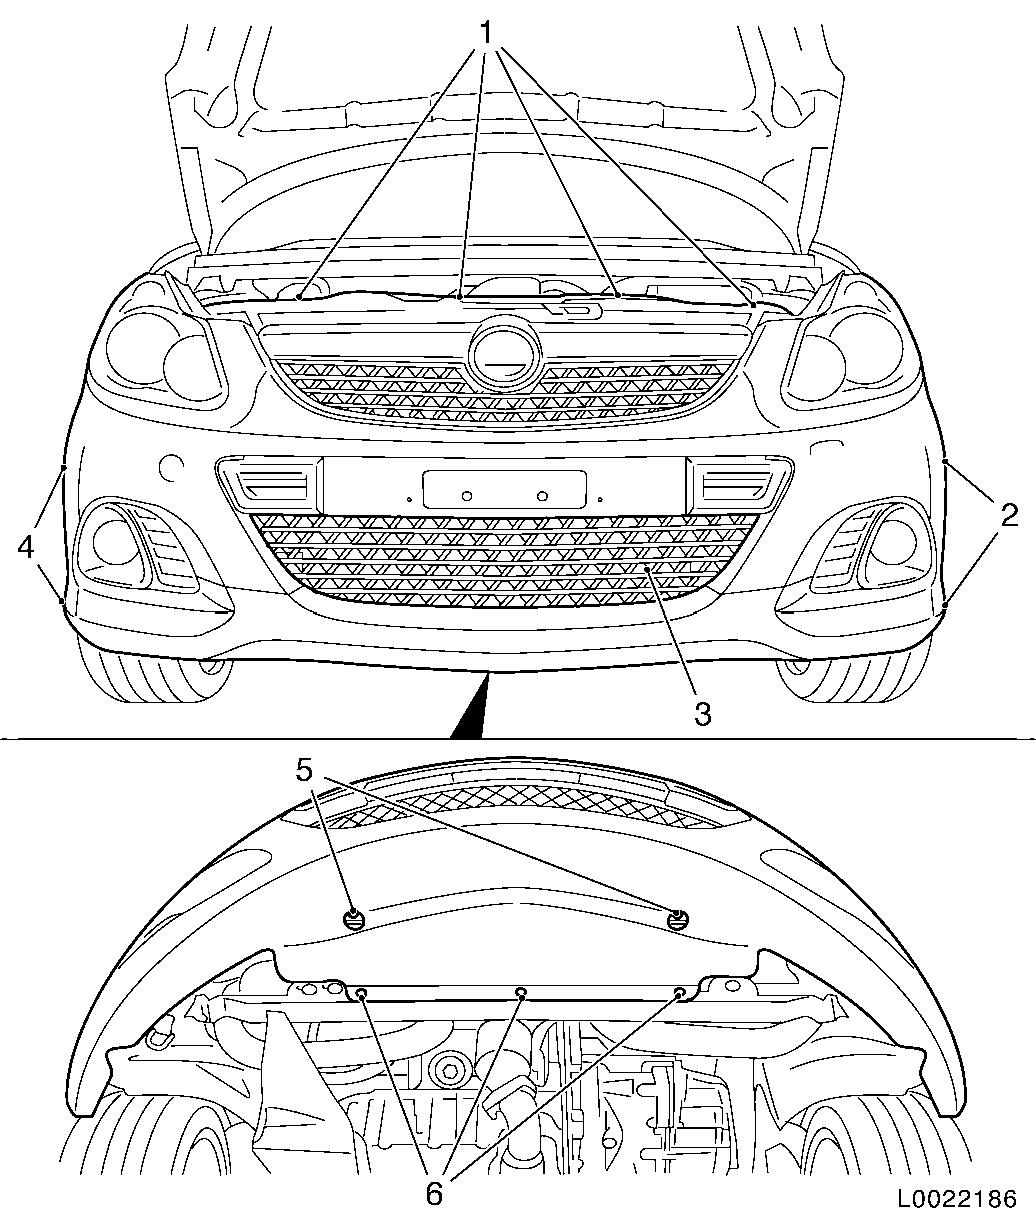 corsa d 263?resize\=665%2C787 holden zafira fuse box layout,zafira free download printable,Fuse Box Diagram For 2002 Opel Omega